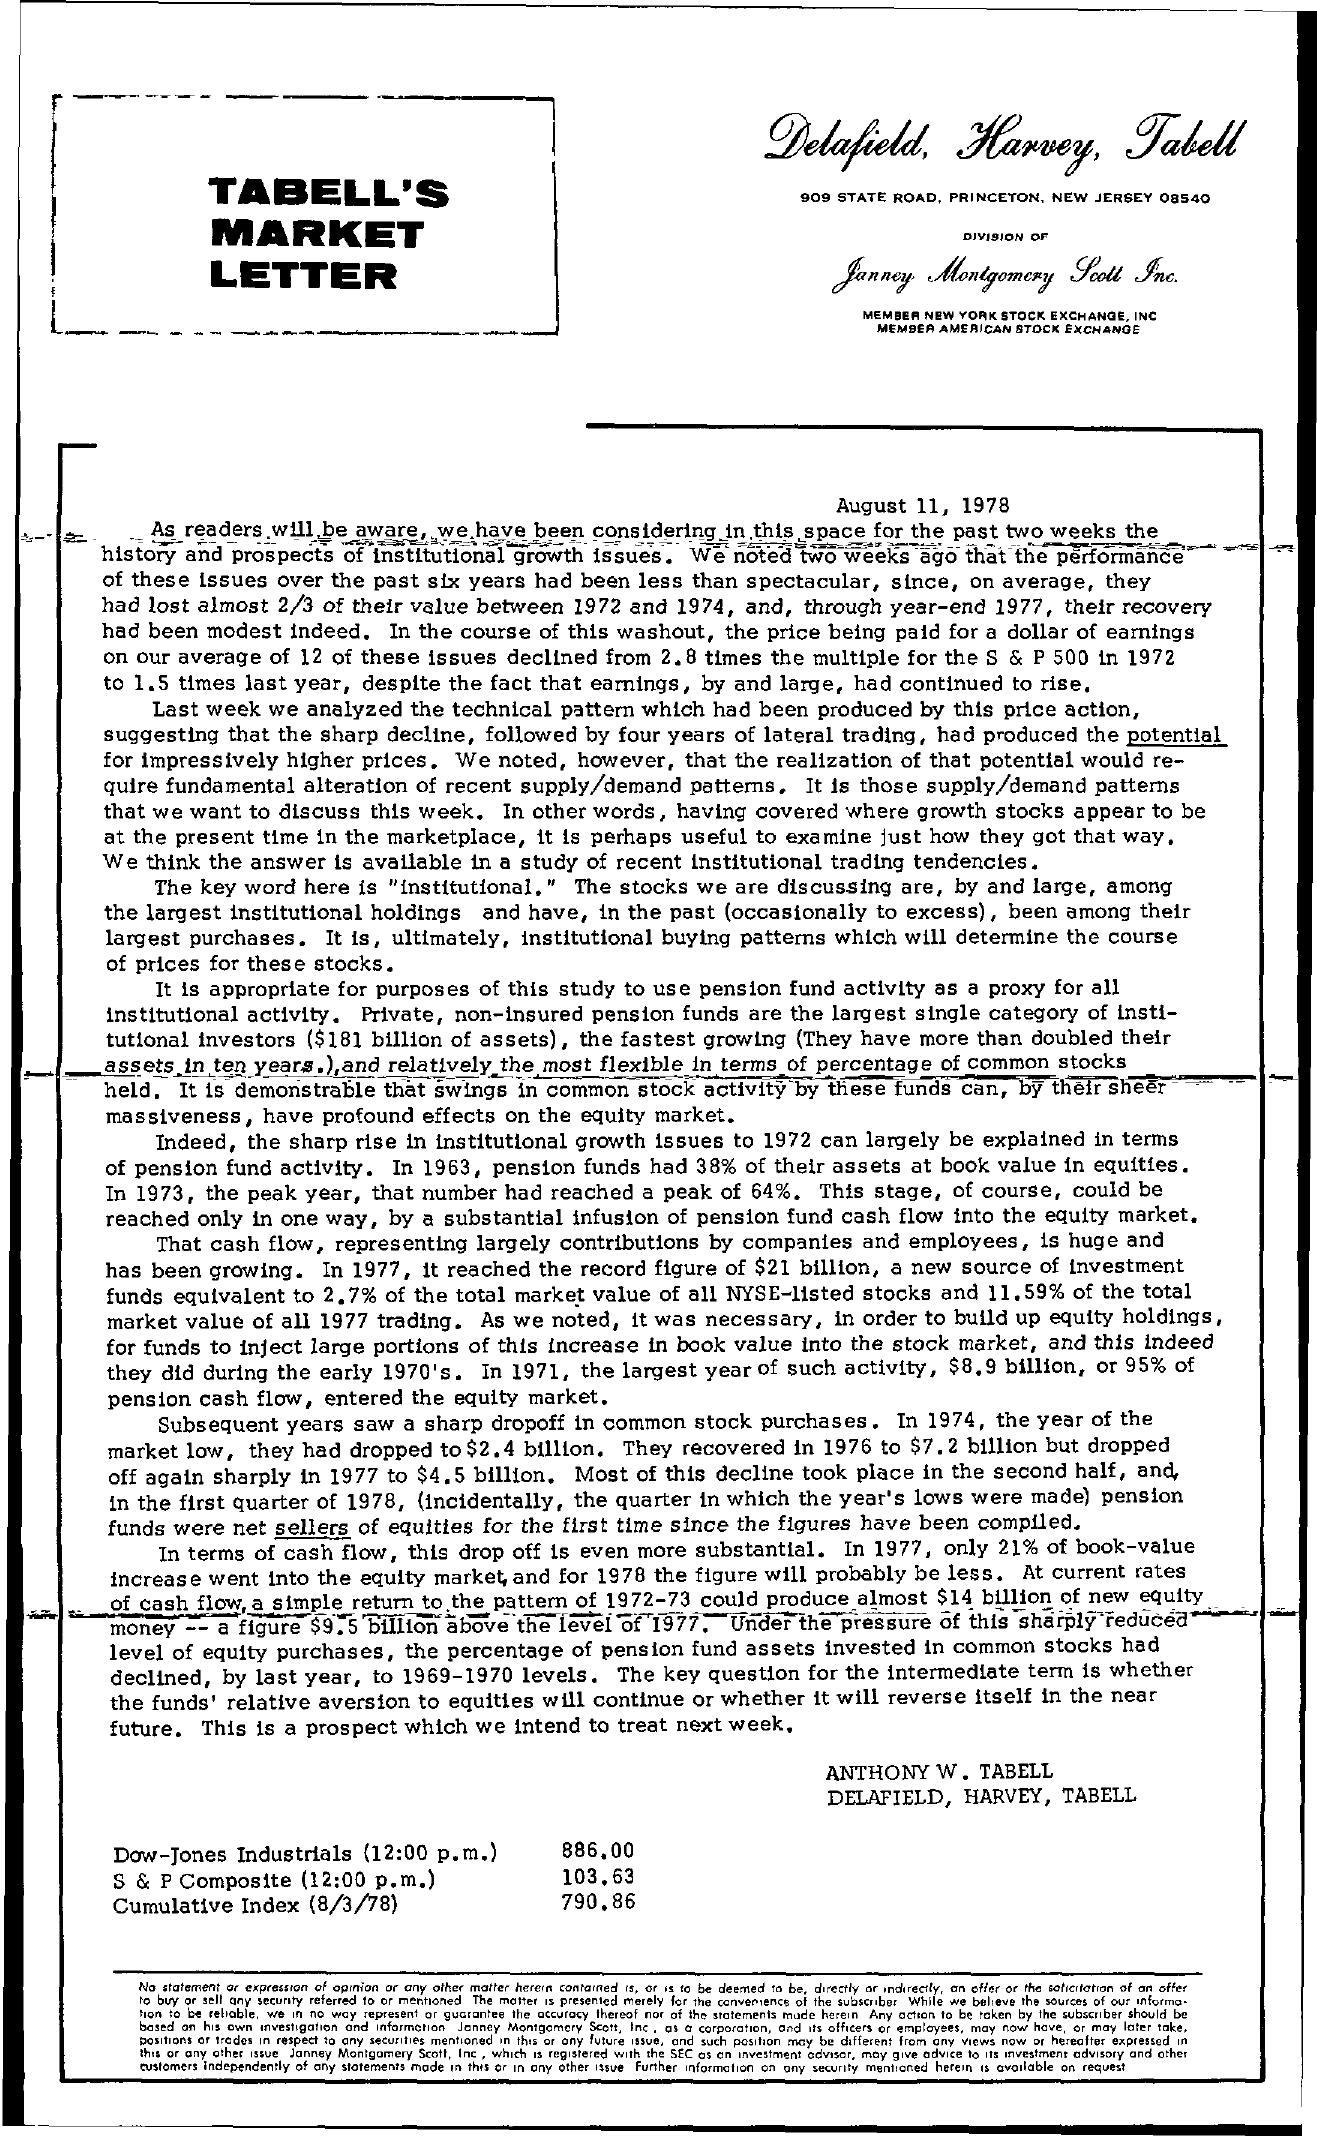 Tabell's Market Letter - August 11, 1978